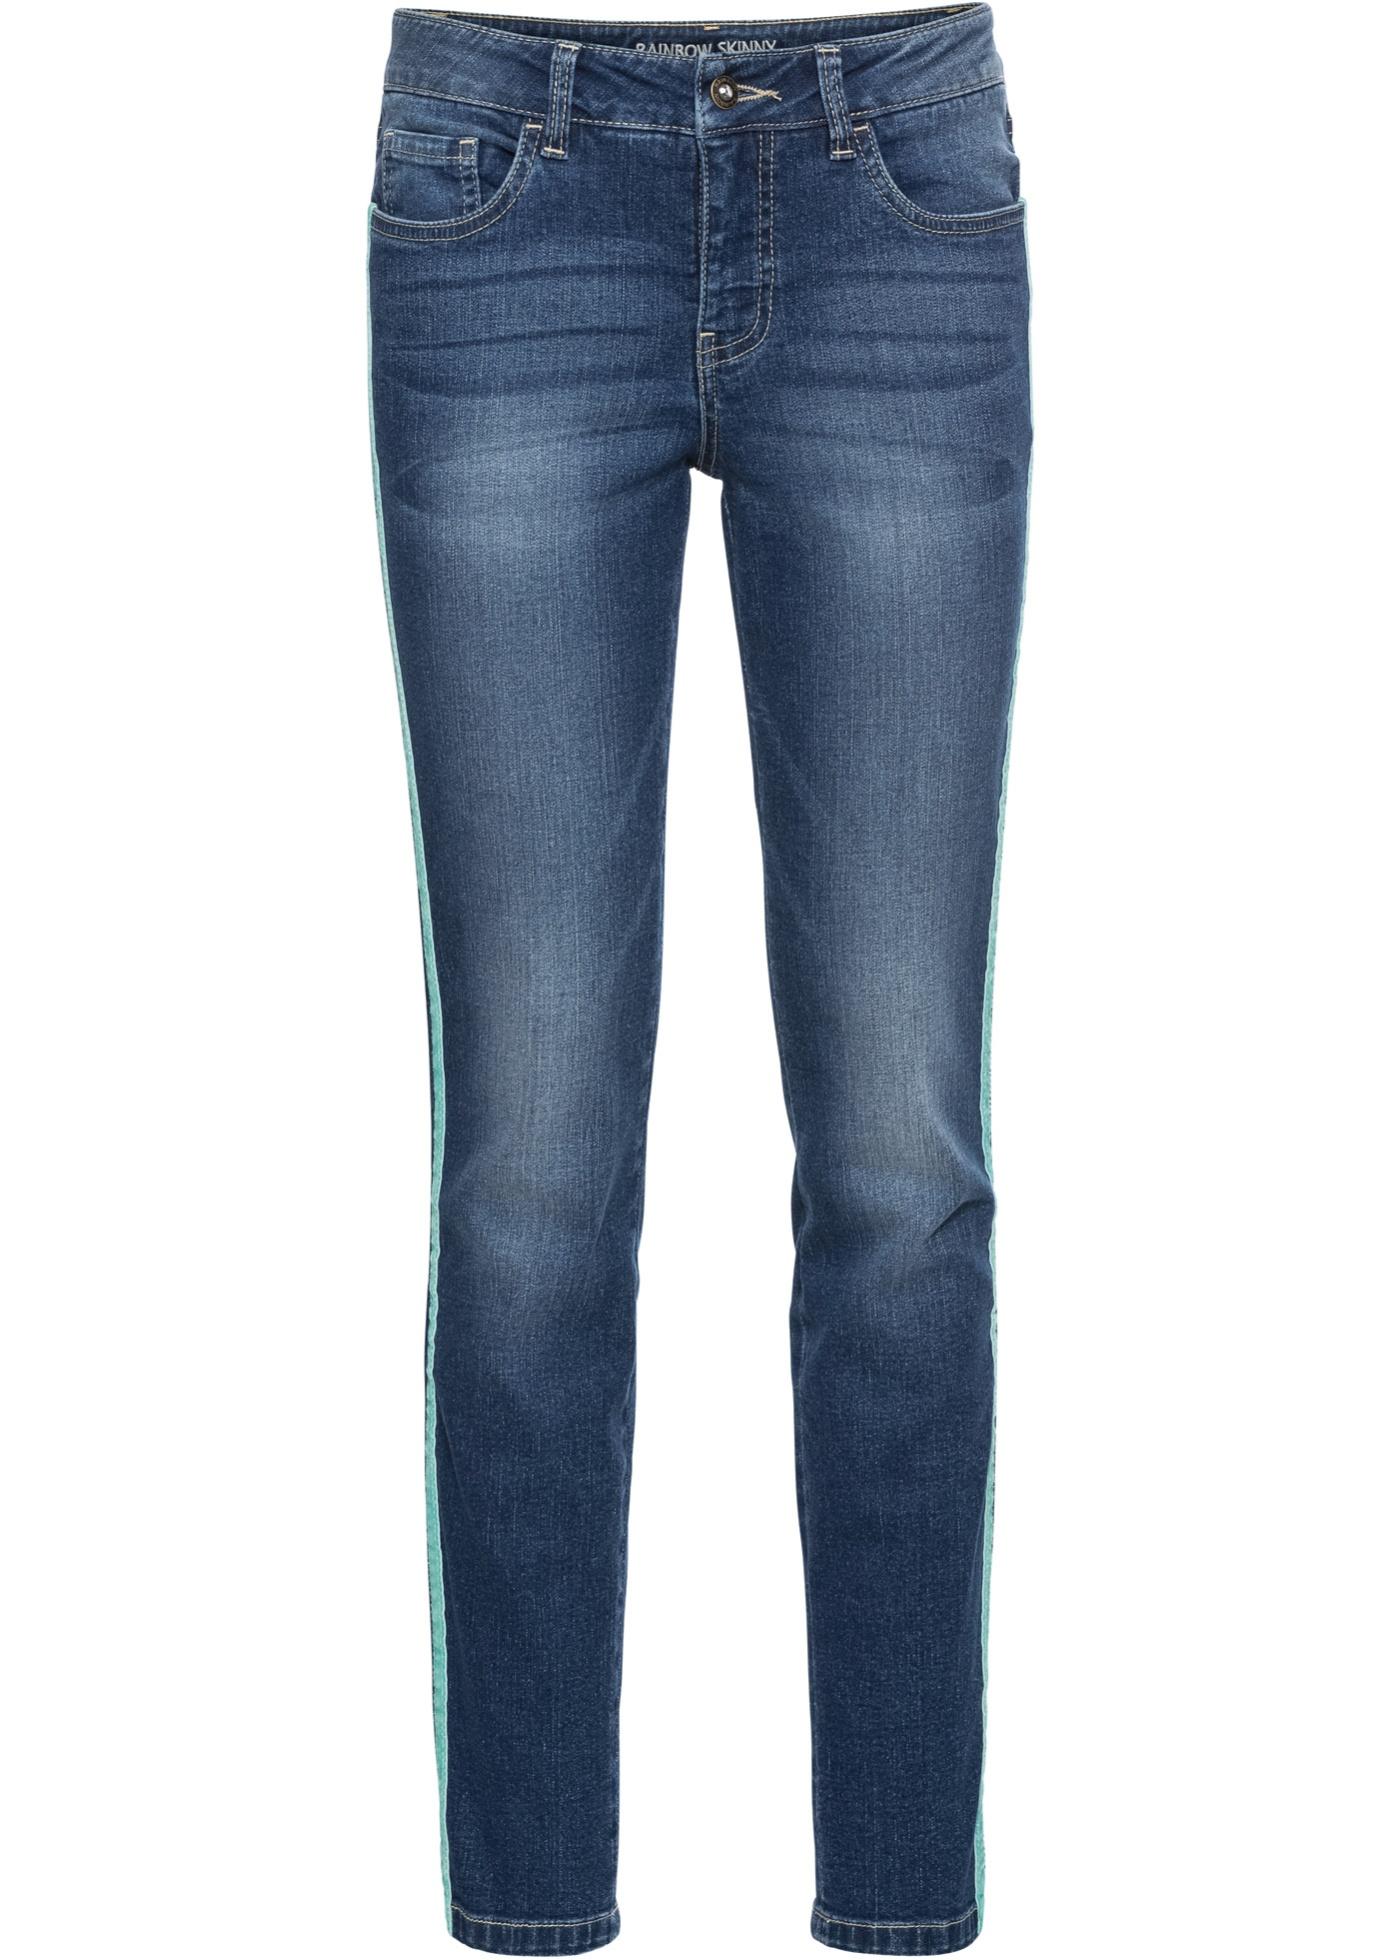 Bande Contrastante BonprixJean Pour Skinny Raccourci Avec Femme Rainbow Bleu wkX8P0nO